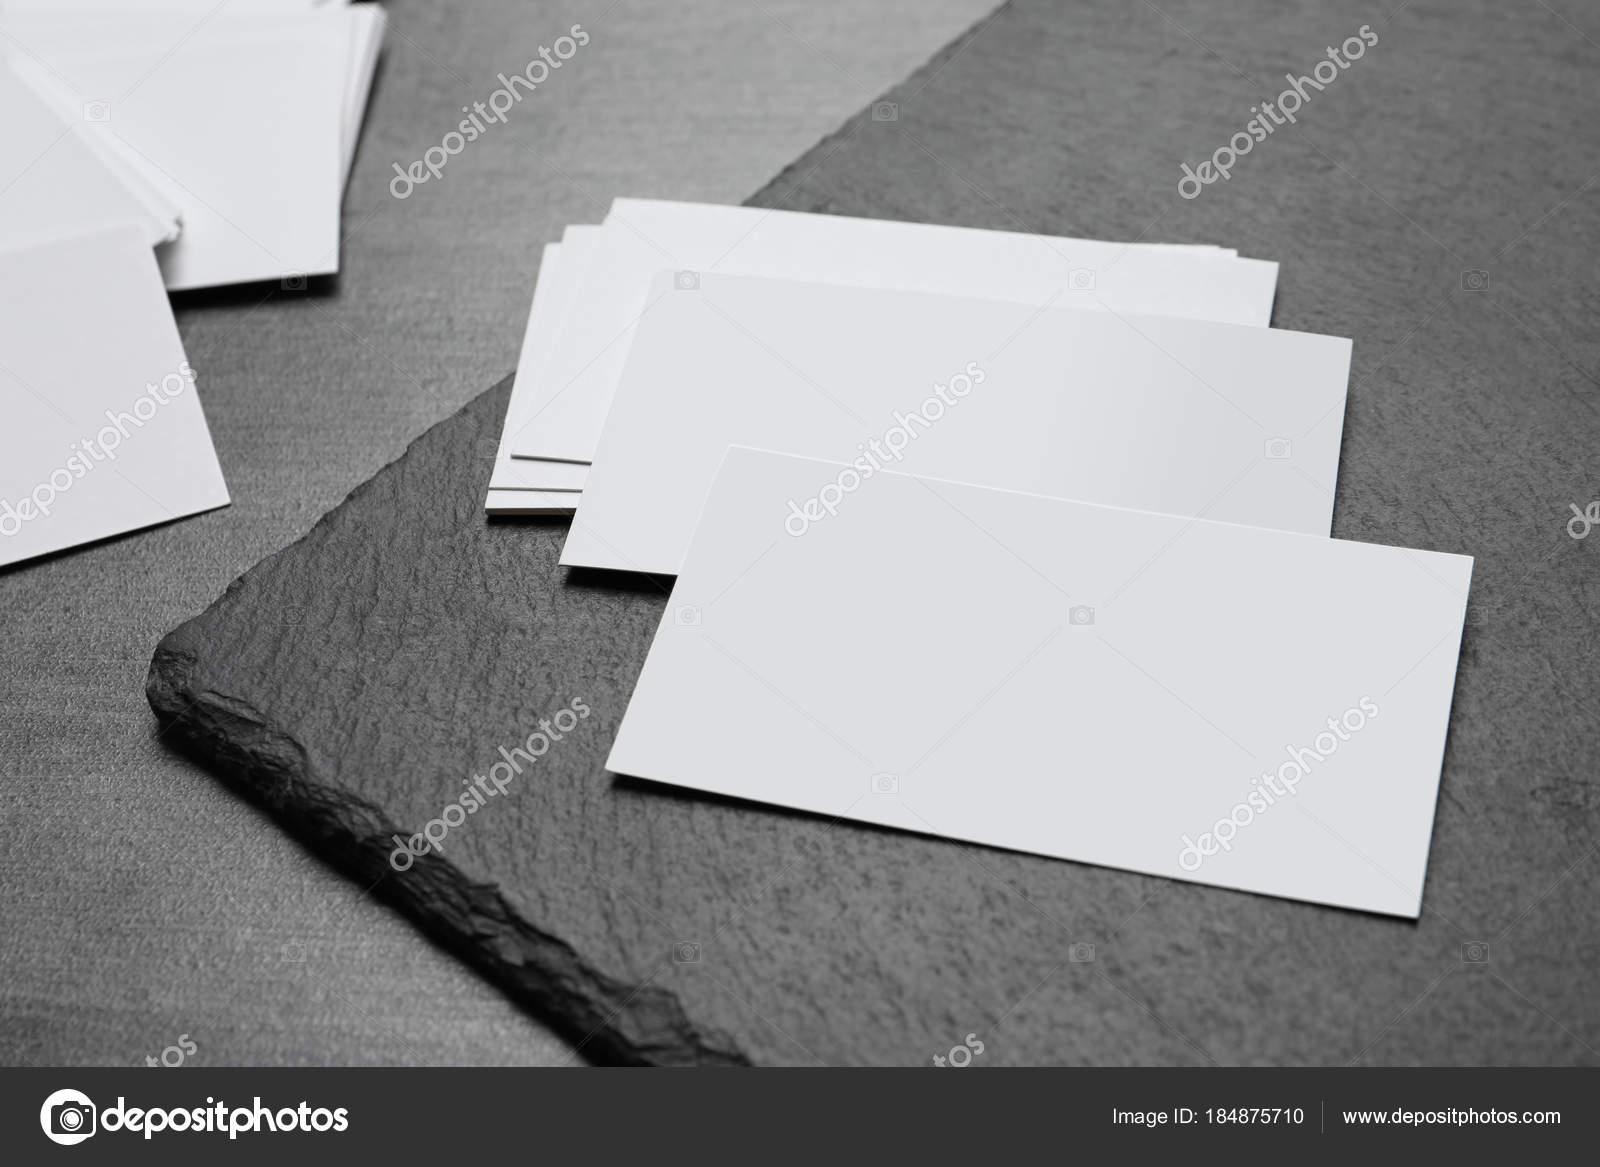 Blank business cards stock photo belchonock 184875710 blank business cards with slate plate on grey background photo by belchonock reheart Gallery